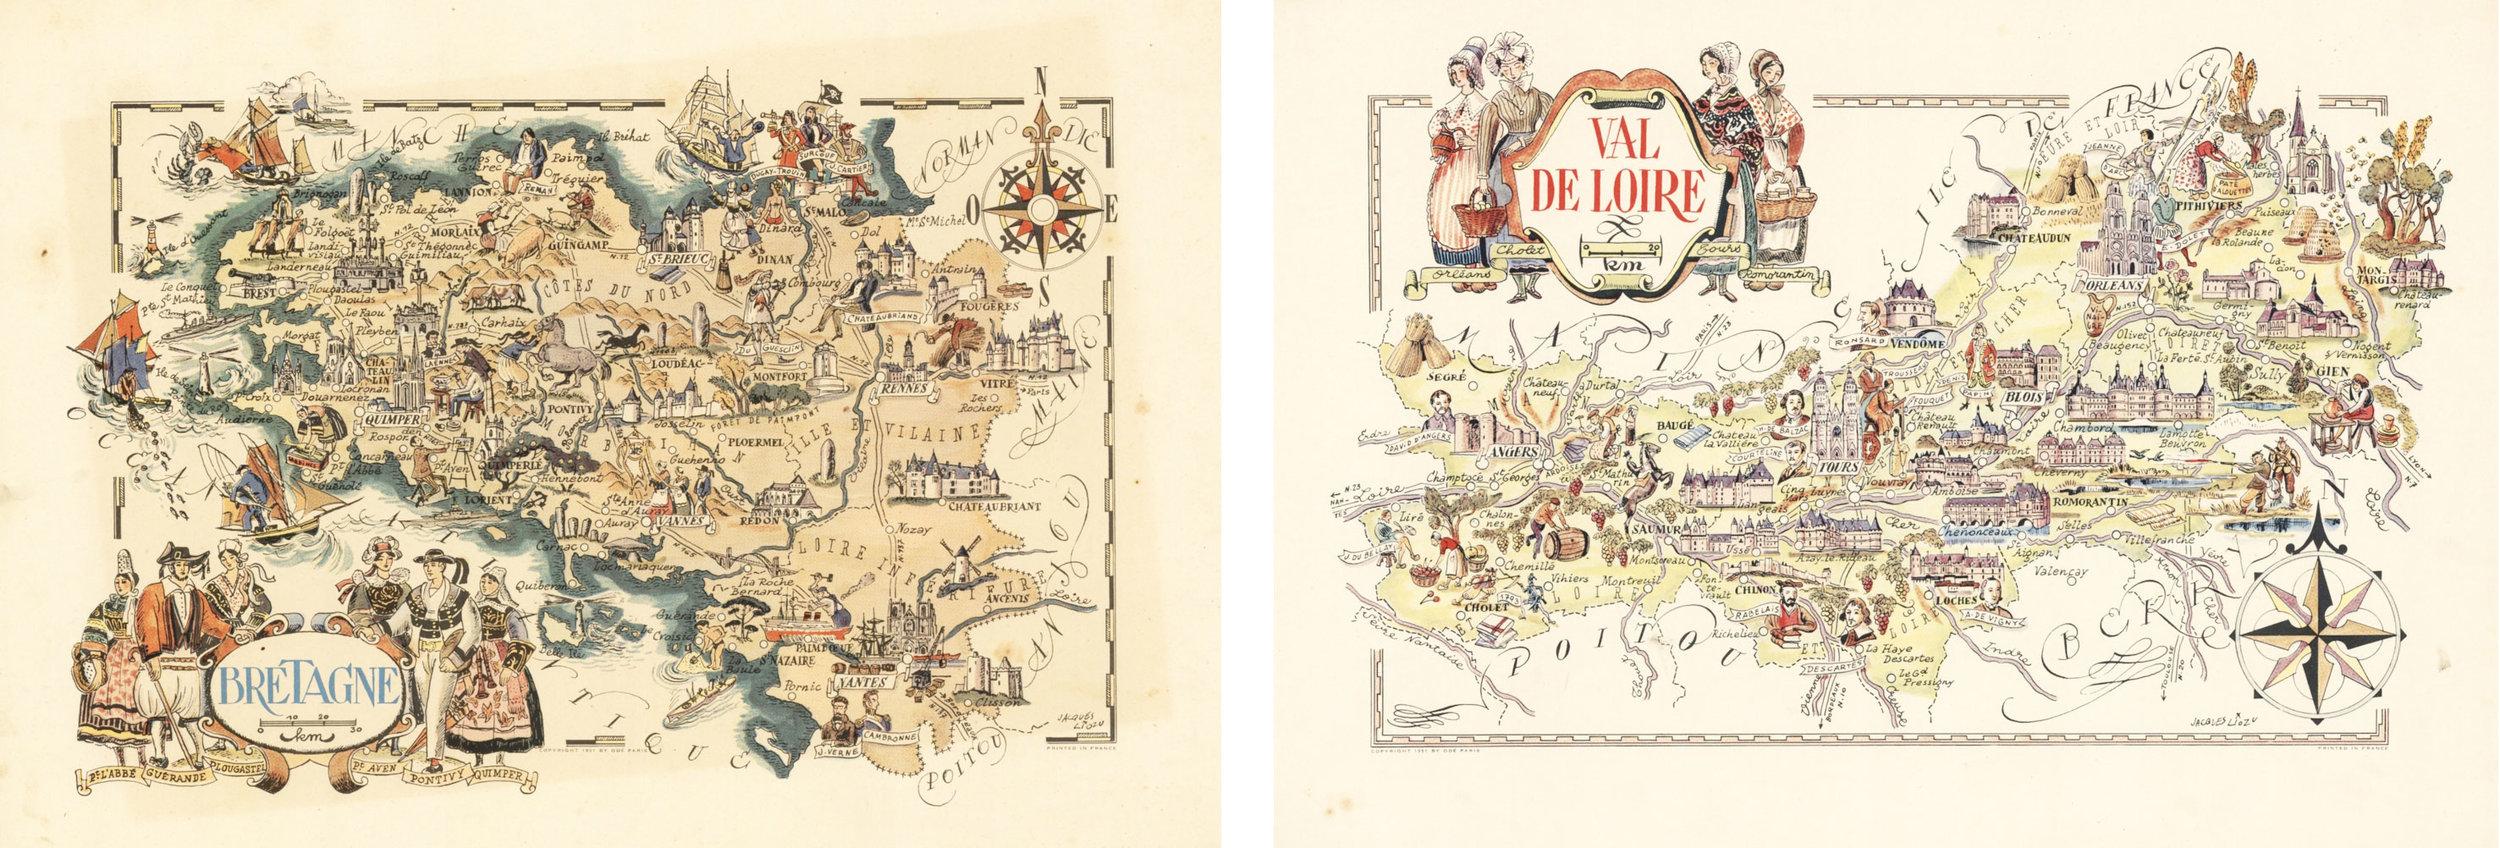 JL-Map-4.jpg